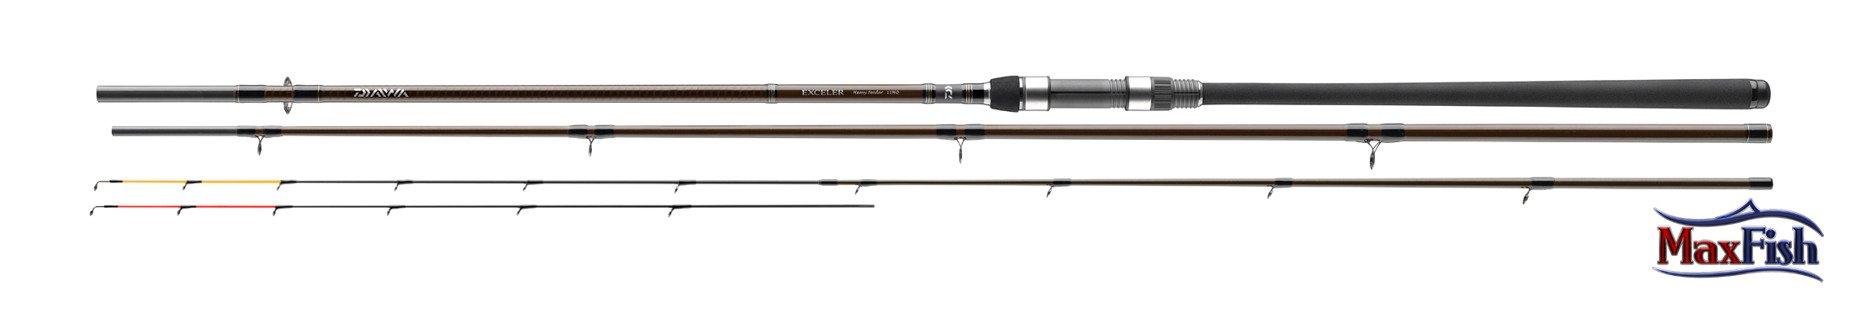 Daiwa Exceler Method Feeder  360cm 80g